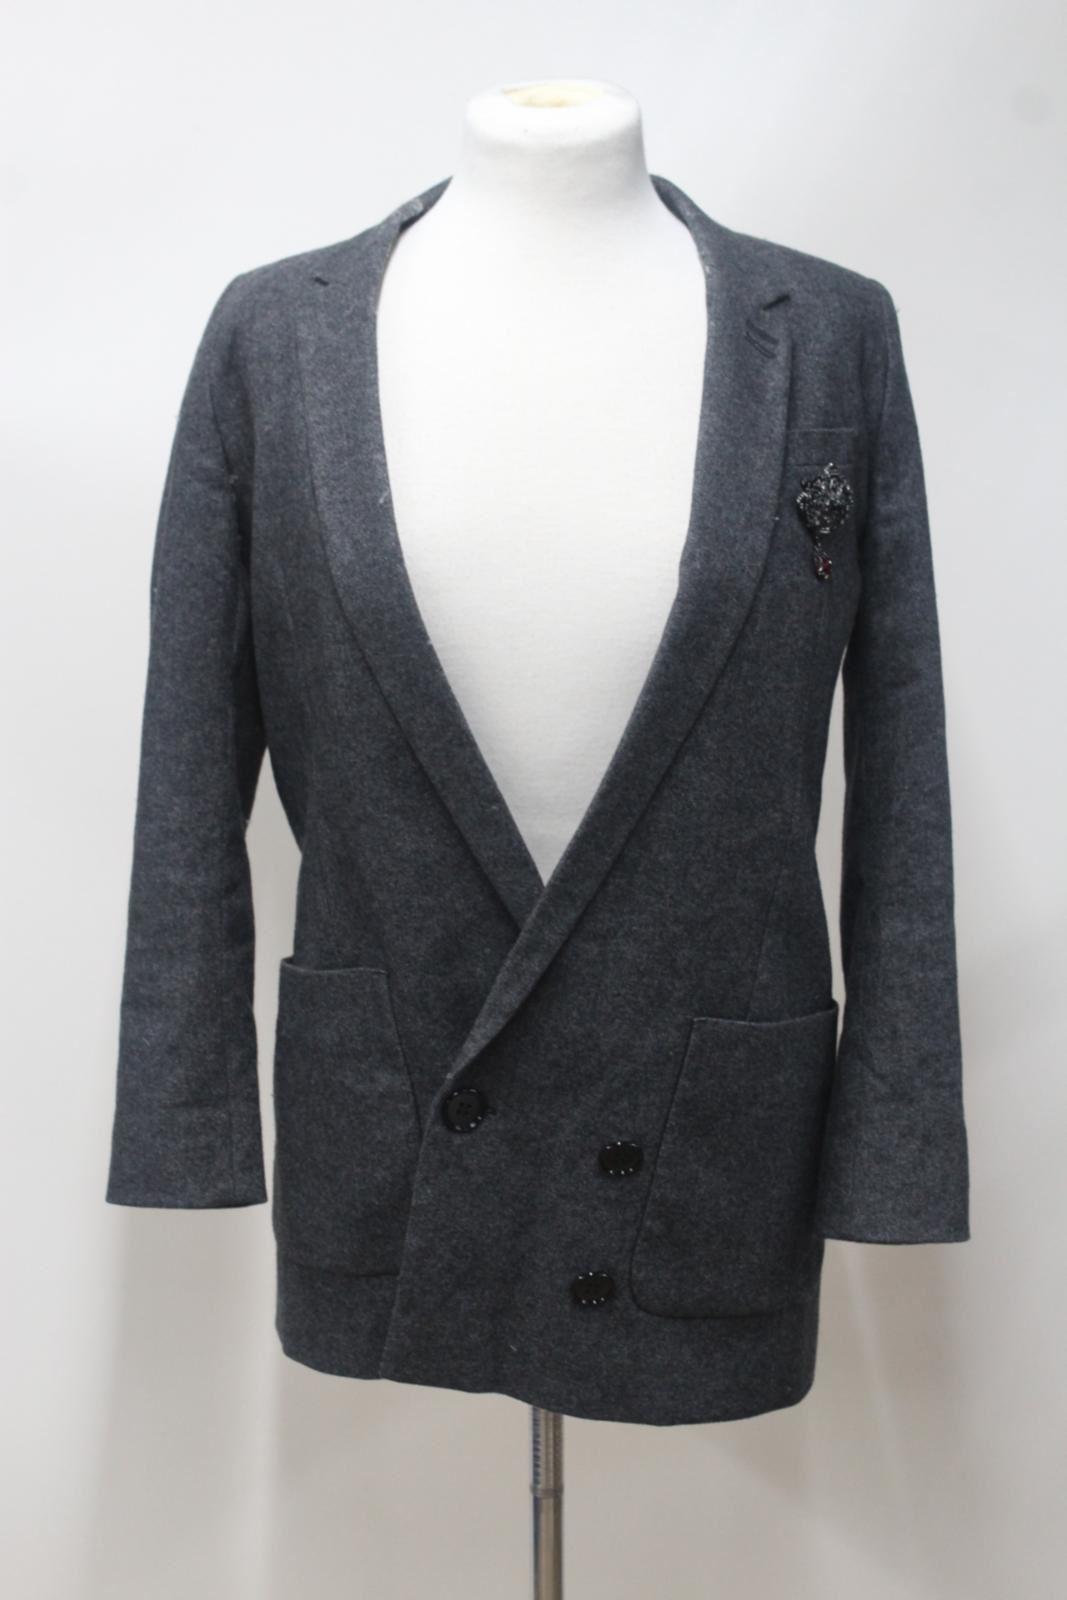 THE-KOOPLES-Ladies-Grey-Wool-Blend-Double-Breasted-Blazer-Jacket-32-XS